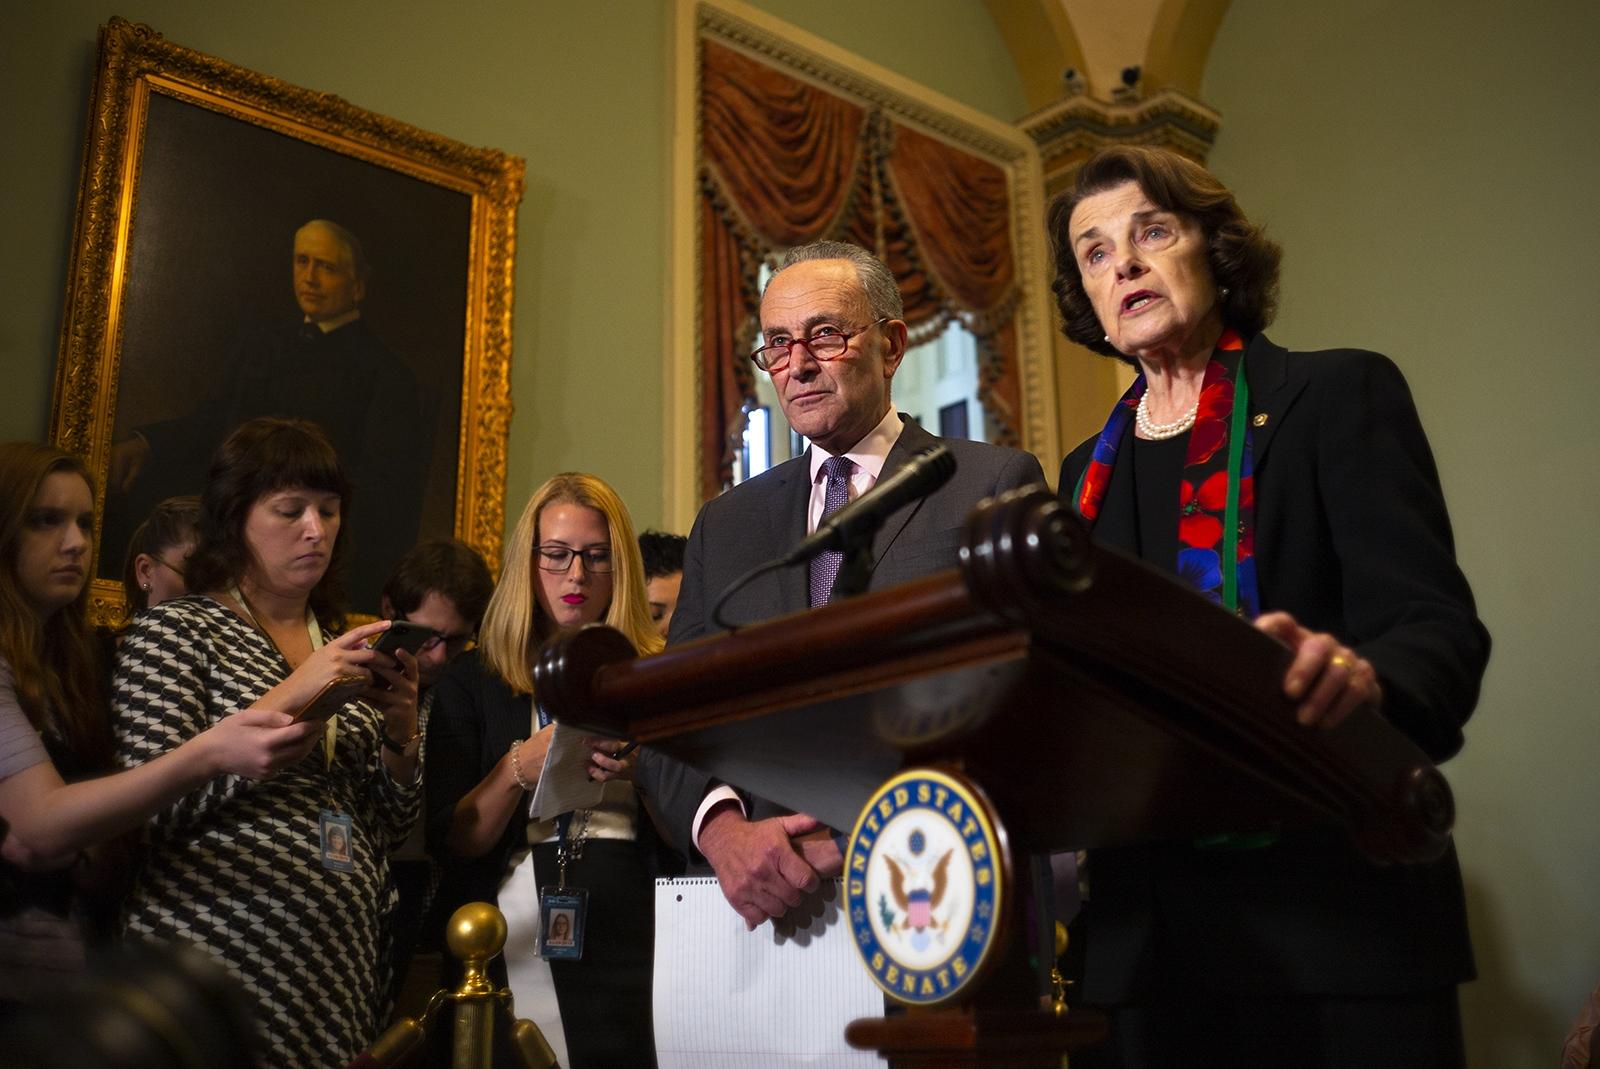 Senators Dianne Feinstein and Chuck Schumer make a brief statement after the confidential supplemental background check was released to senators.